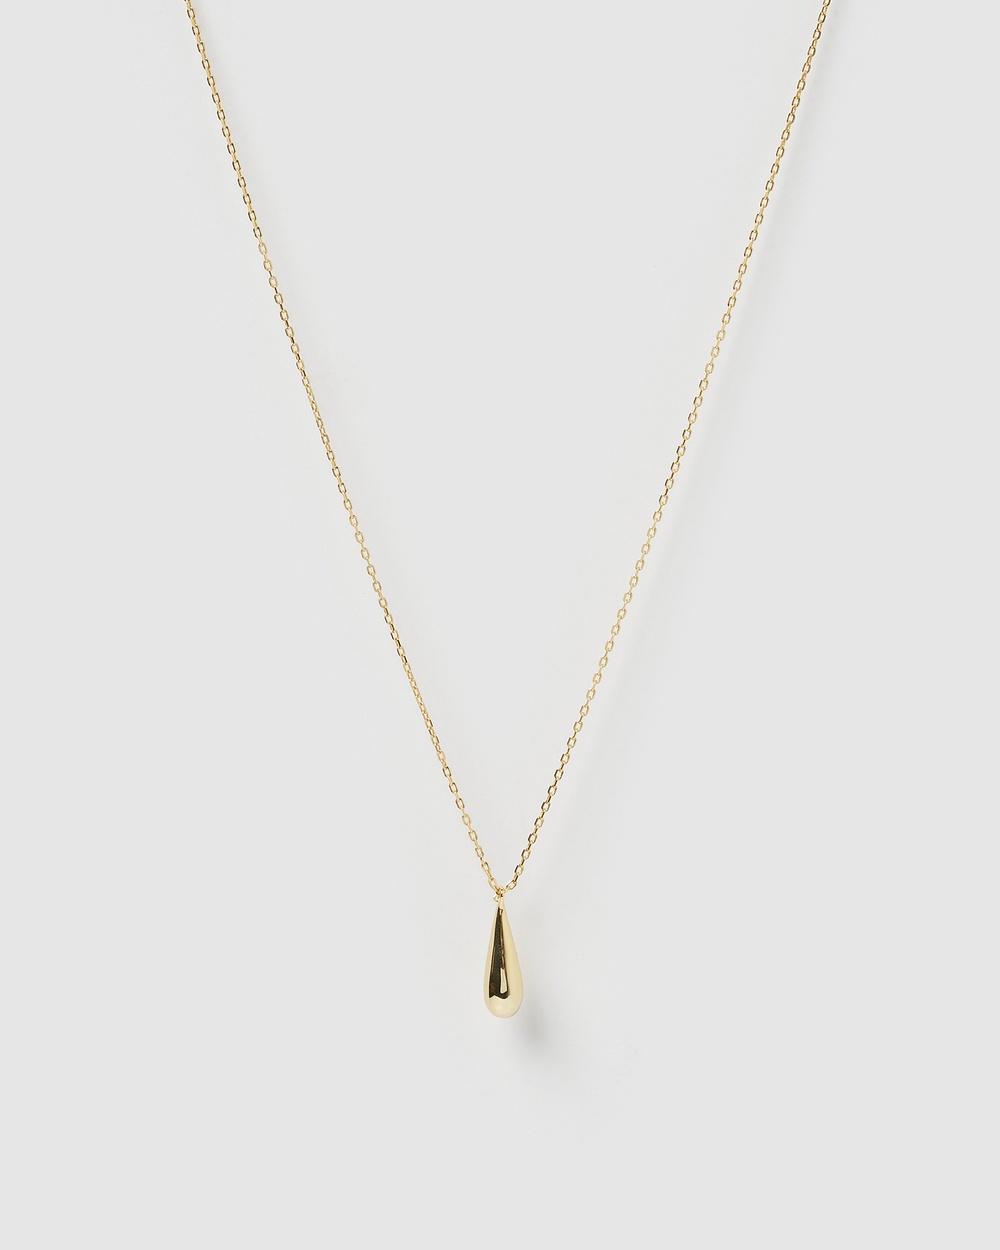 Izoa Cora Necklace Jewellery Gold